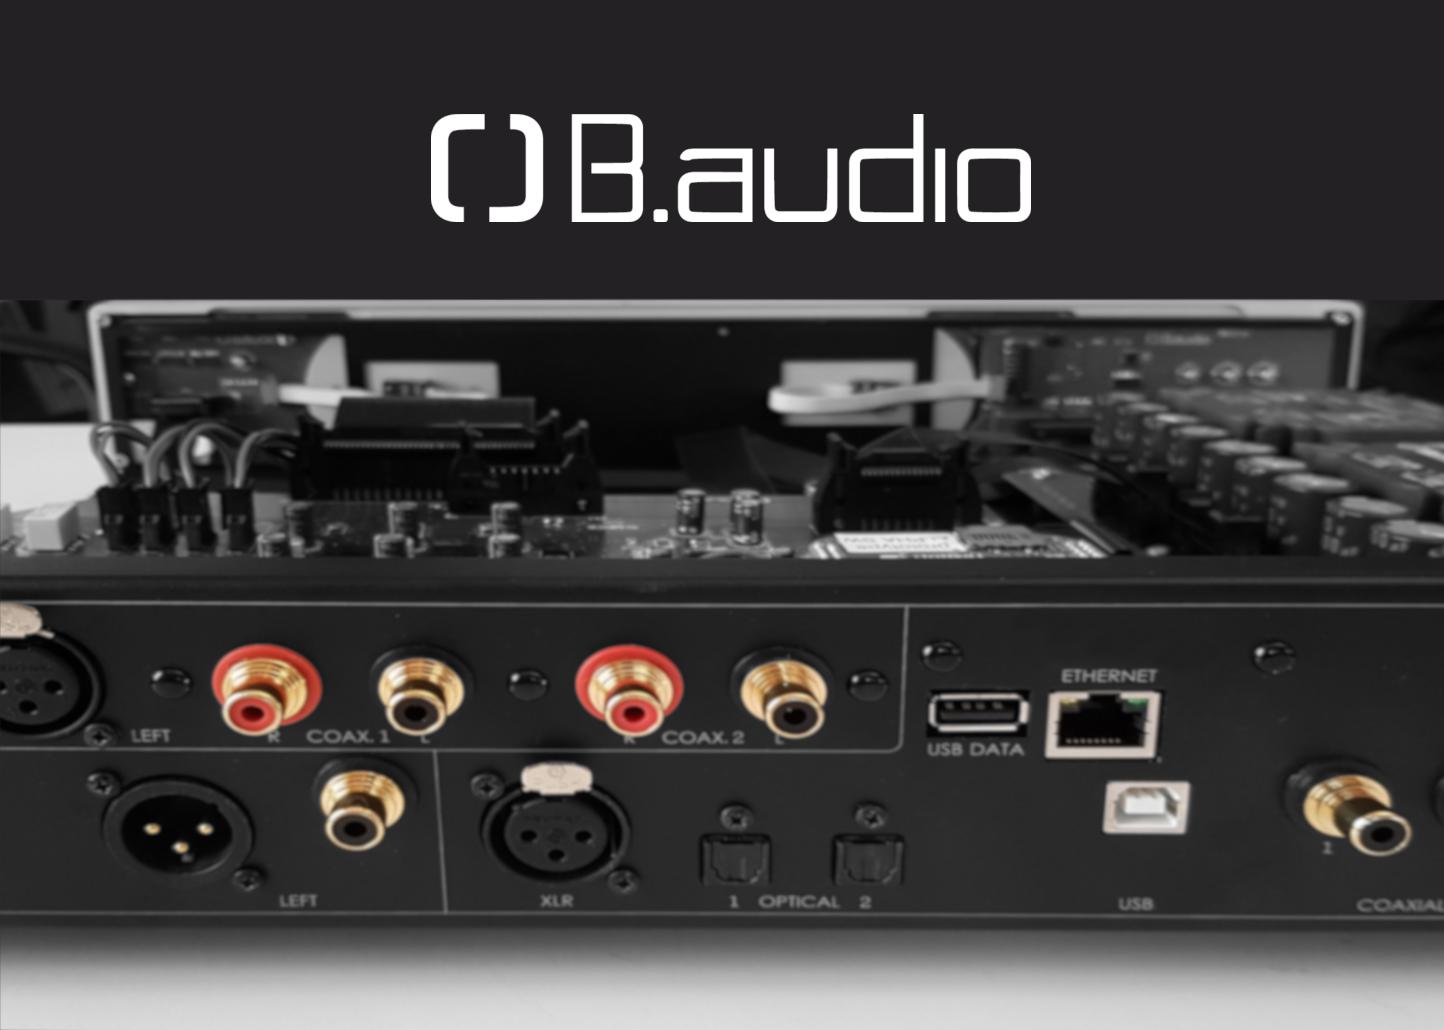 B.audio va offrir une option streamer et equalizer à sa gamme